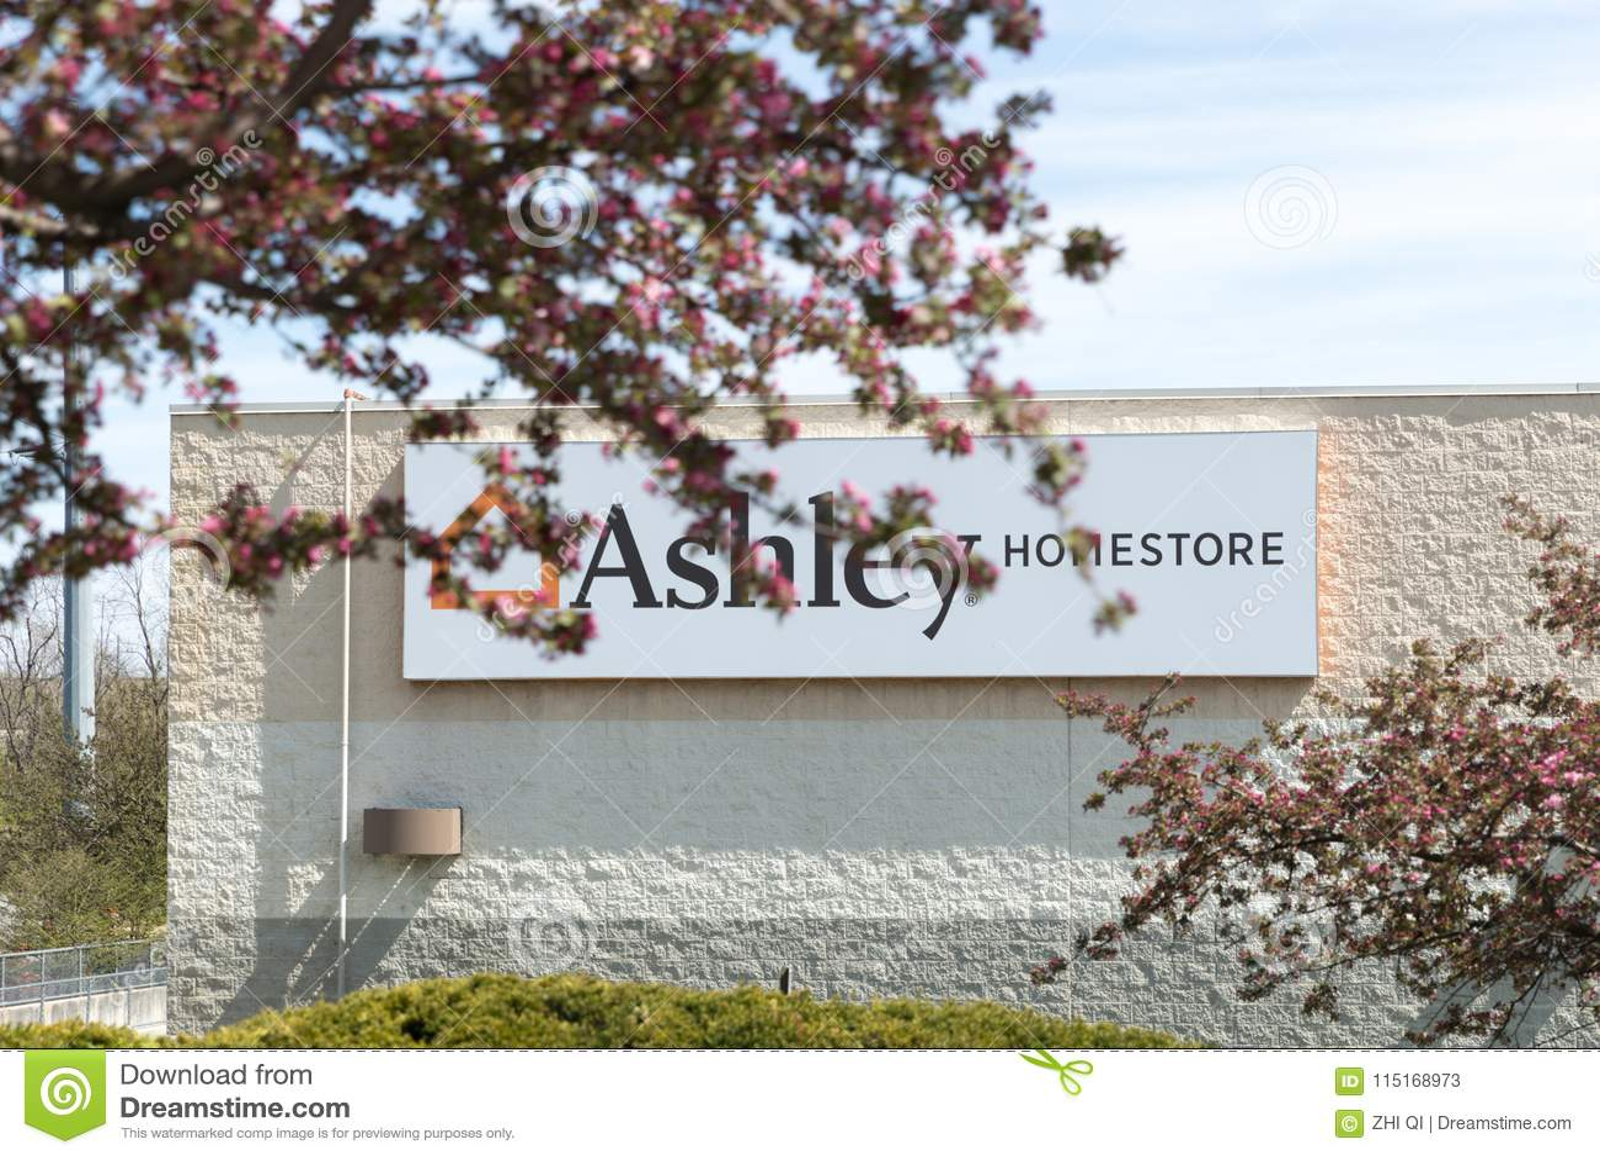 Ashley Furniture Homestore Retail Editorial Stock Photo Image Of